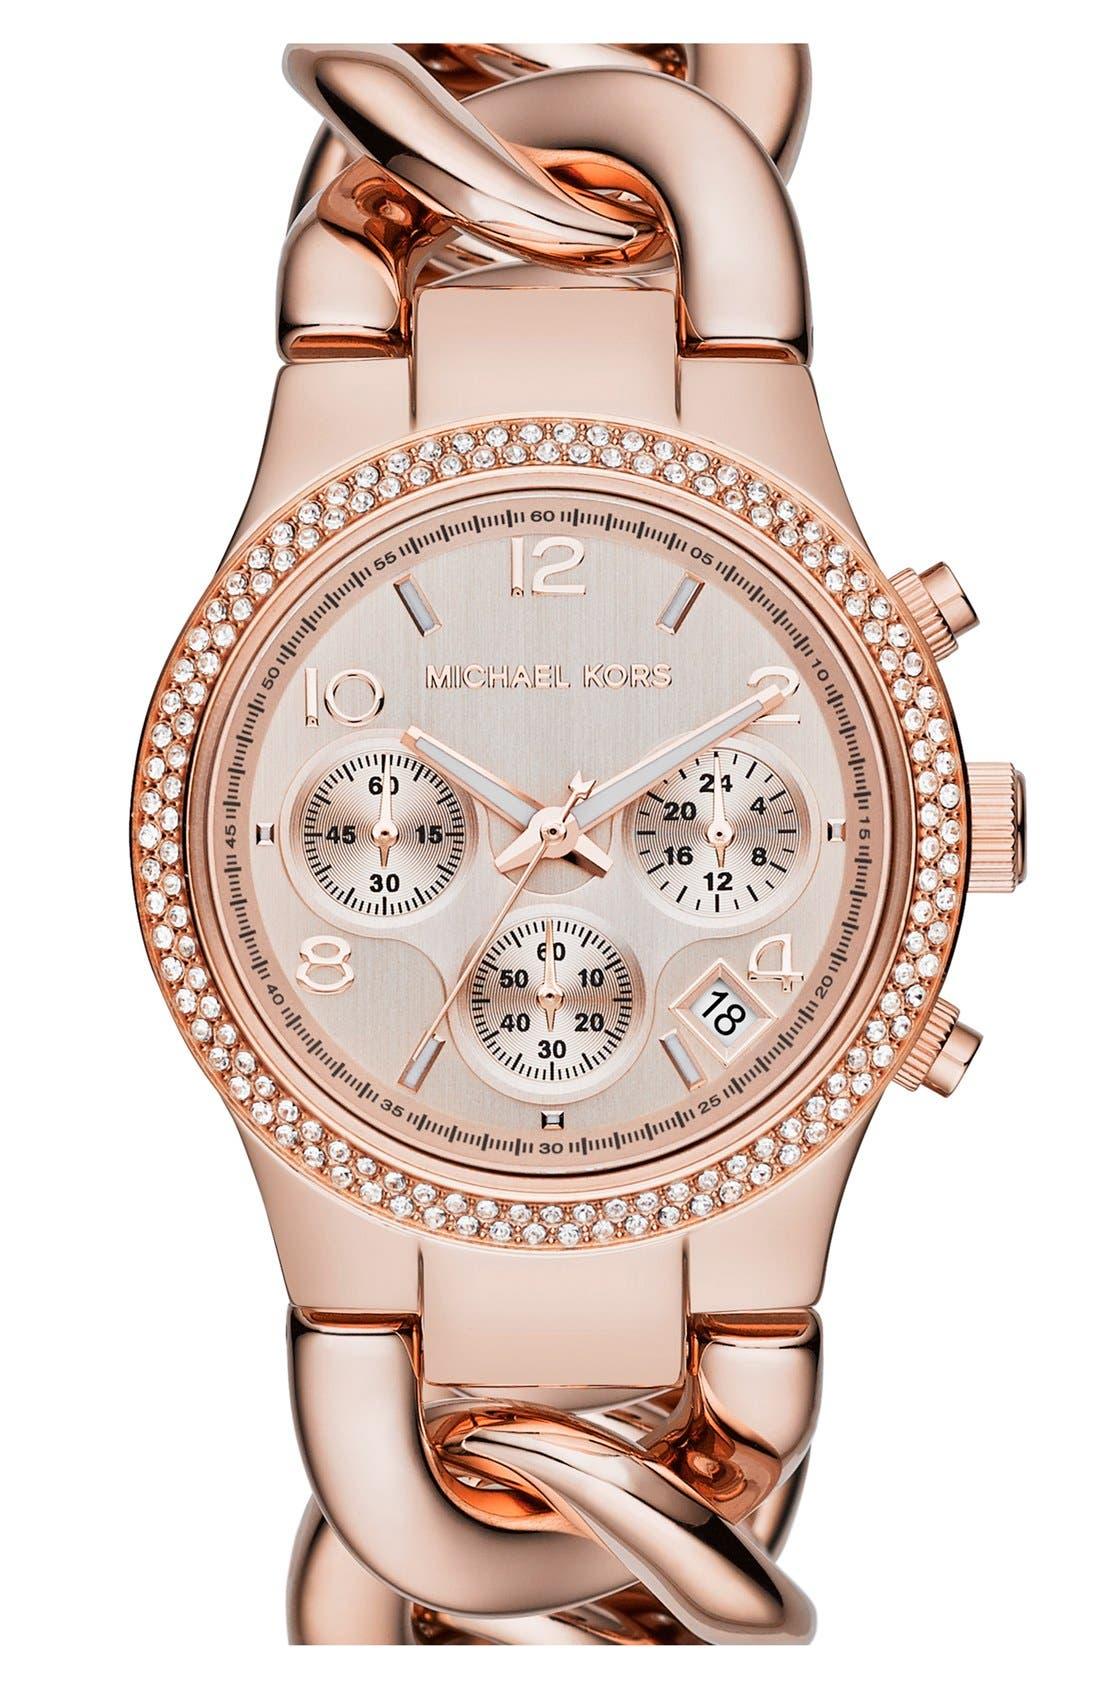 Alternate Image 1 Selected - Michael Kors 'Runway' Chain Bracelet Watch, 38mm